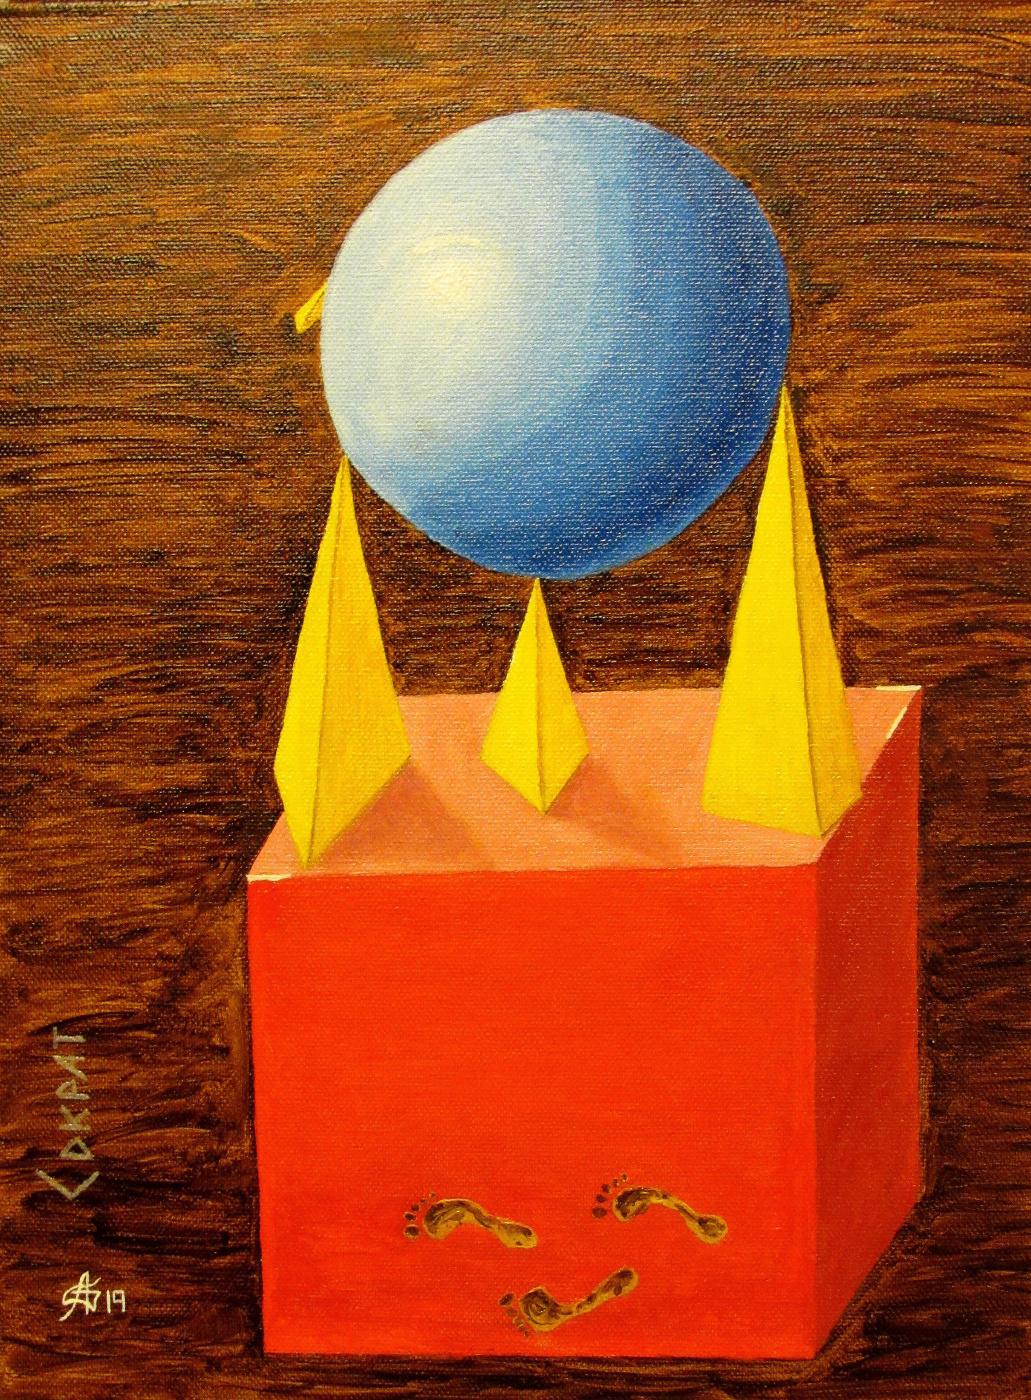 "Artashes Badalyan. Socrates (from the cycle of ""Symbolic geometry"") - xm - 40x30"